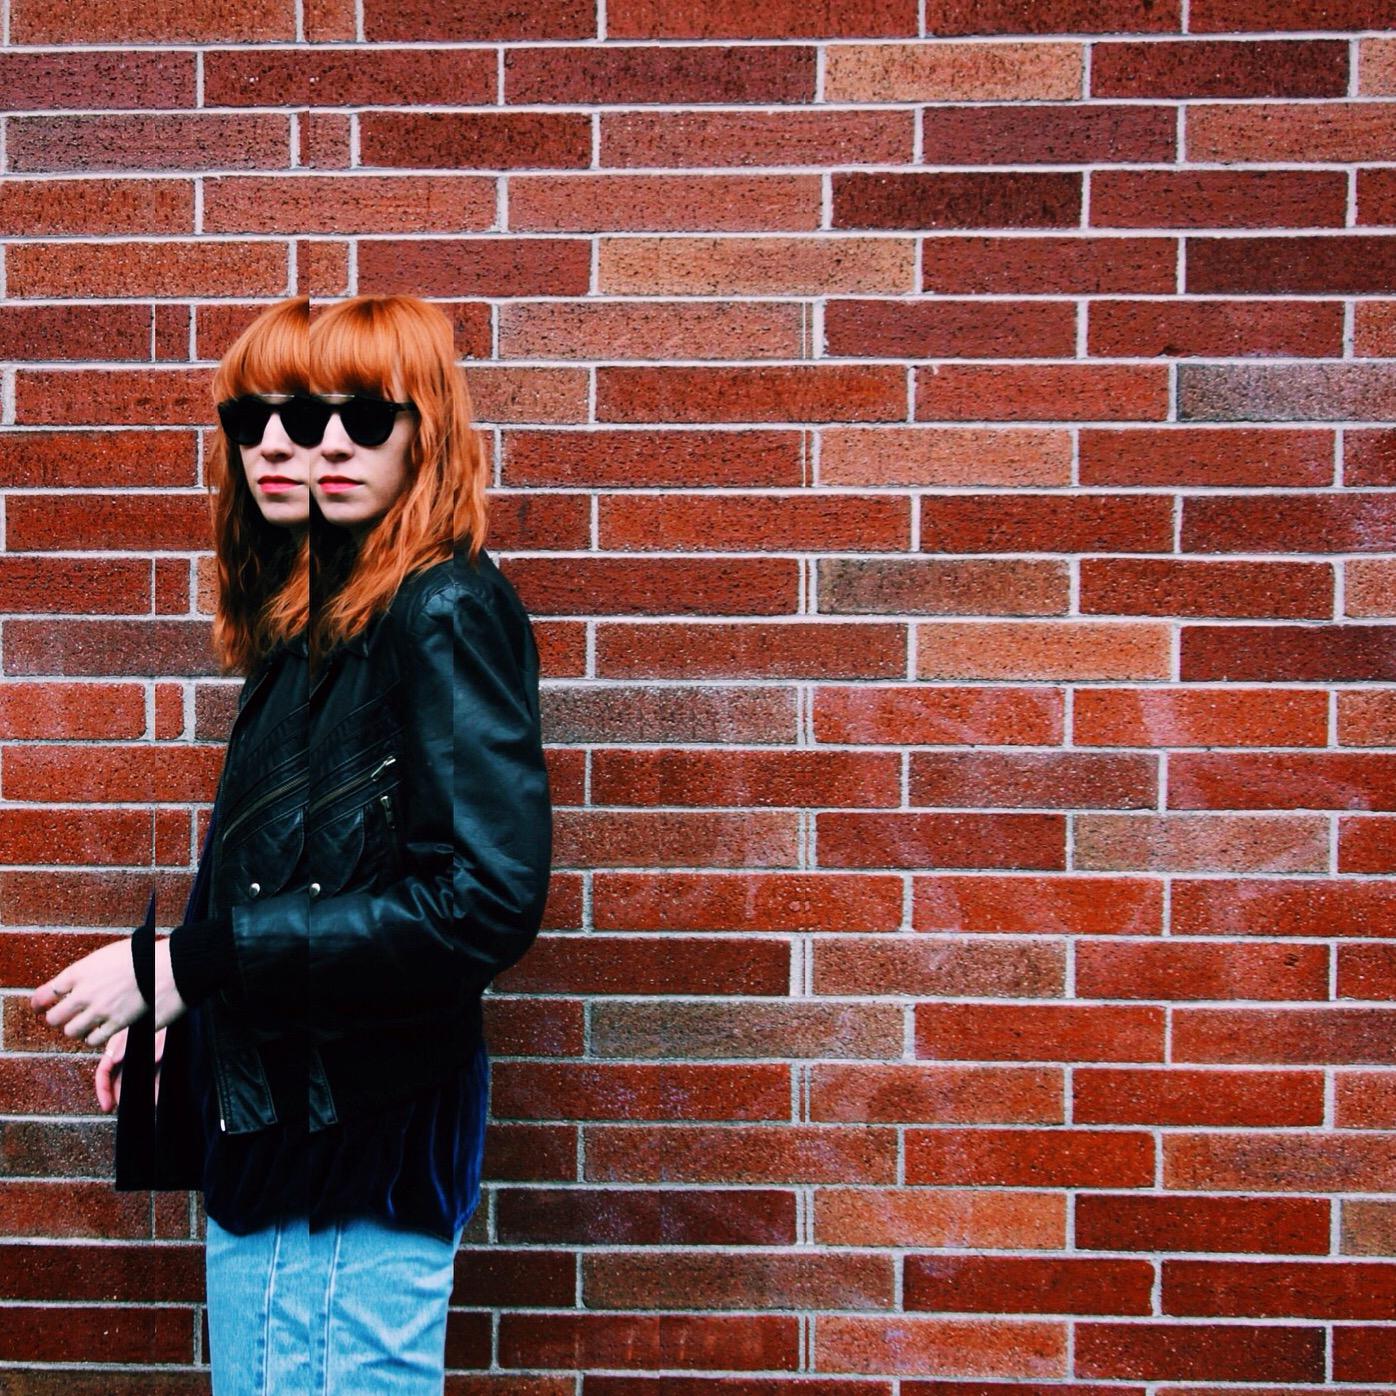 seattle-fashion-blog-art-of-wore-3.jpg